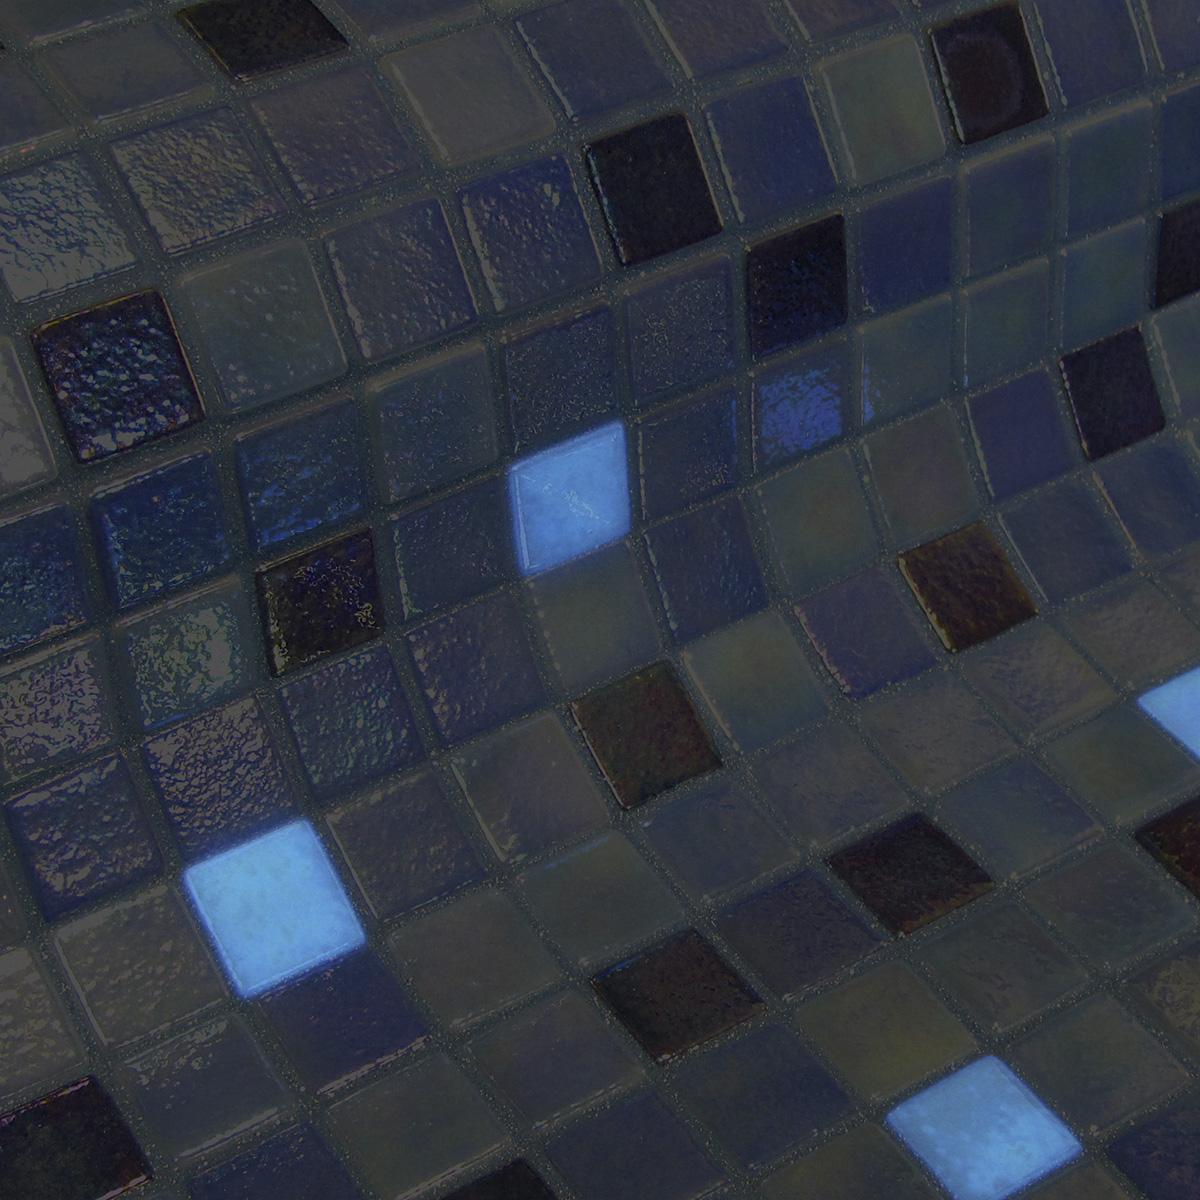 Delphinus-night-Fosfo-Mosaic-Ezarri.jpg